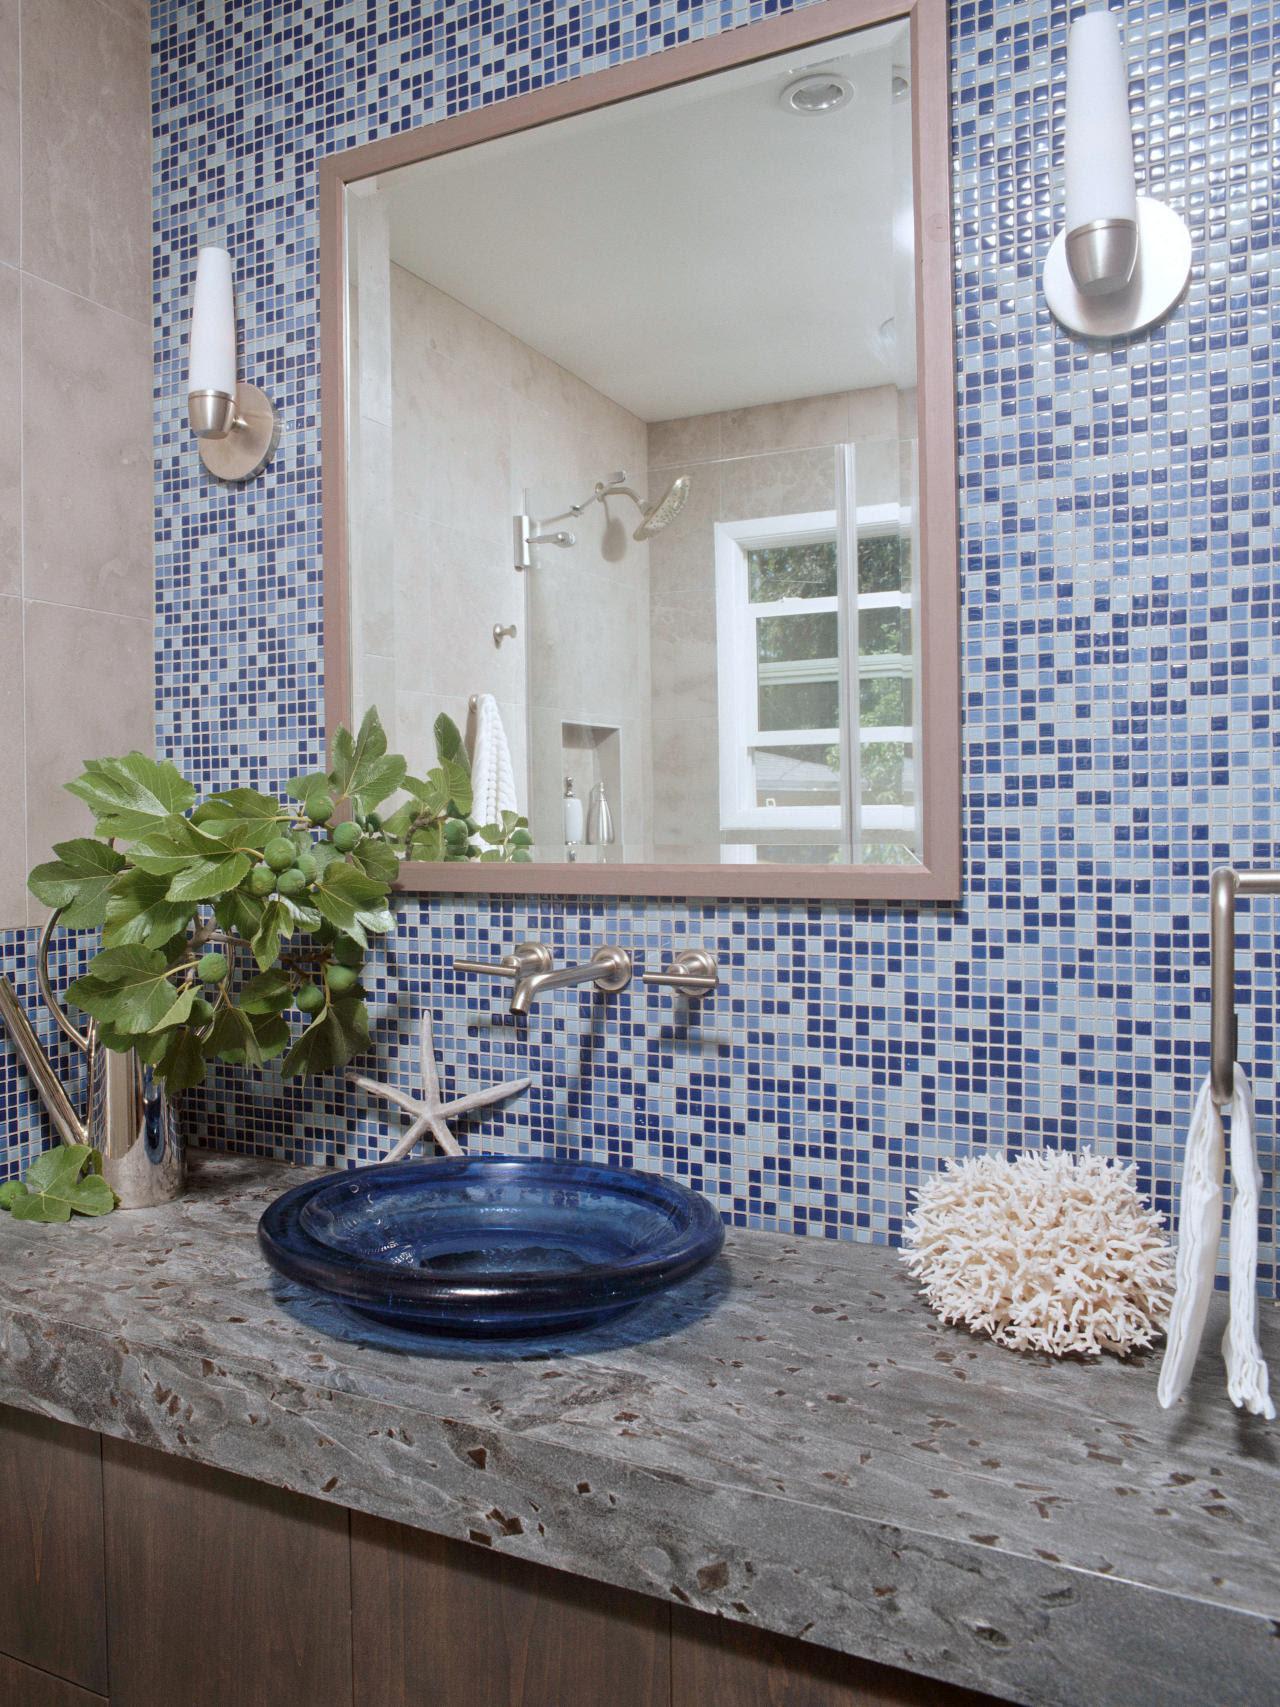 Hidden Spaces in Your Small Bathroom | HGTV